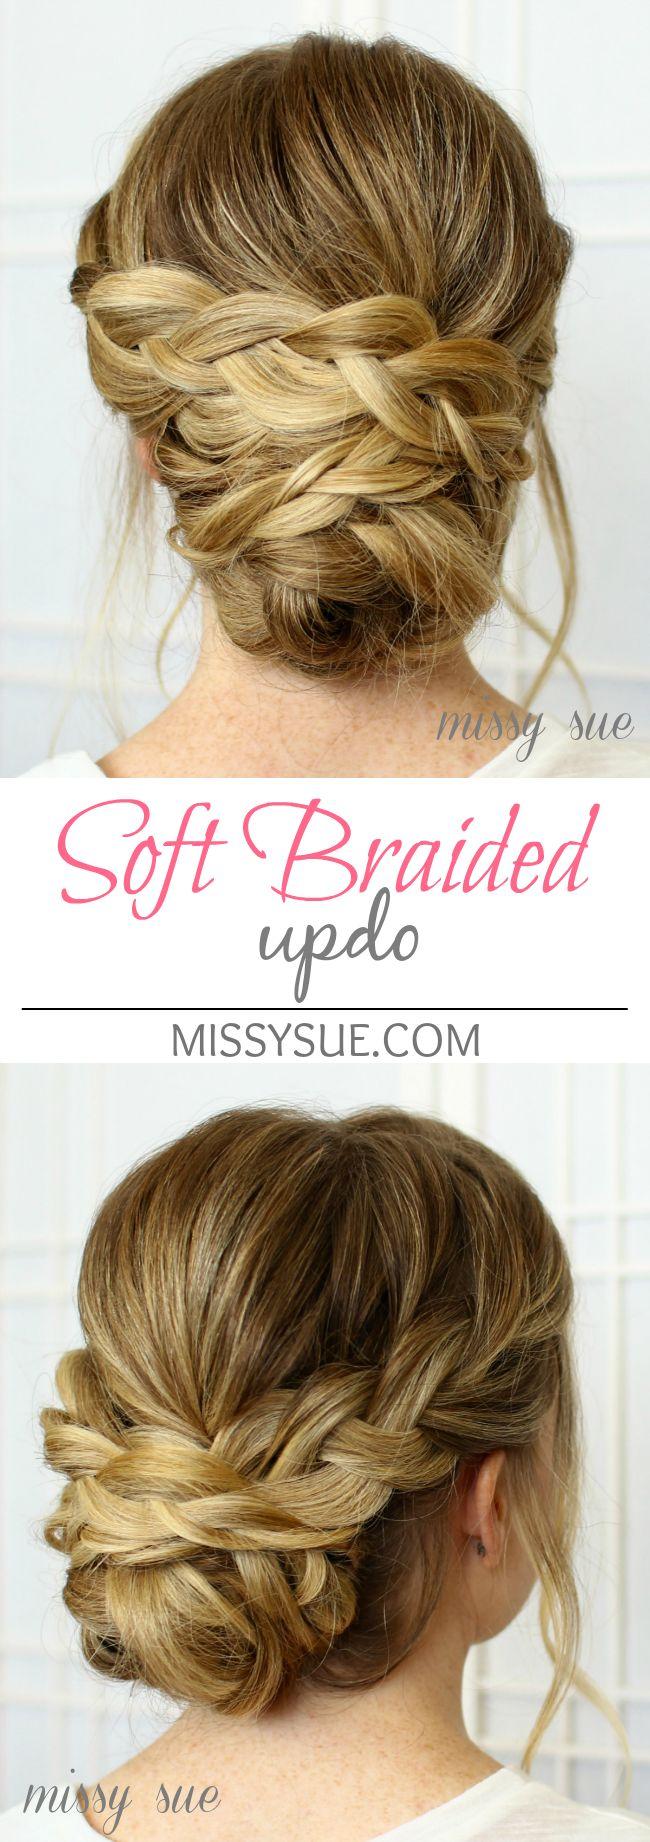 braided updo ideas